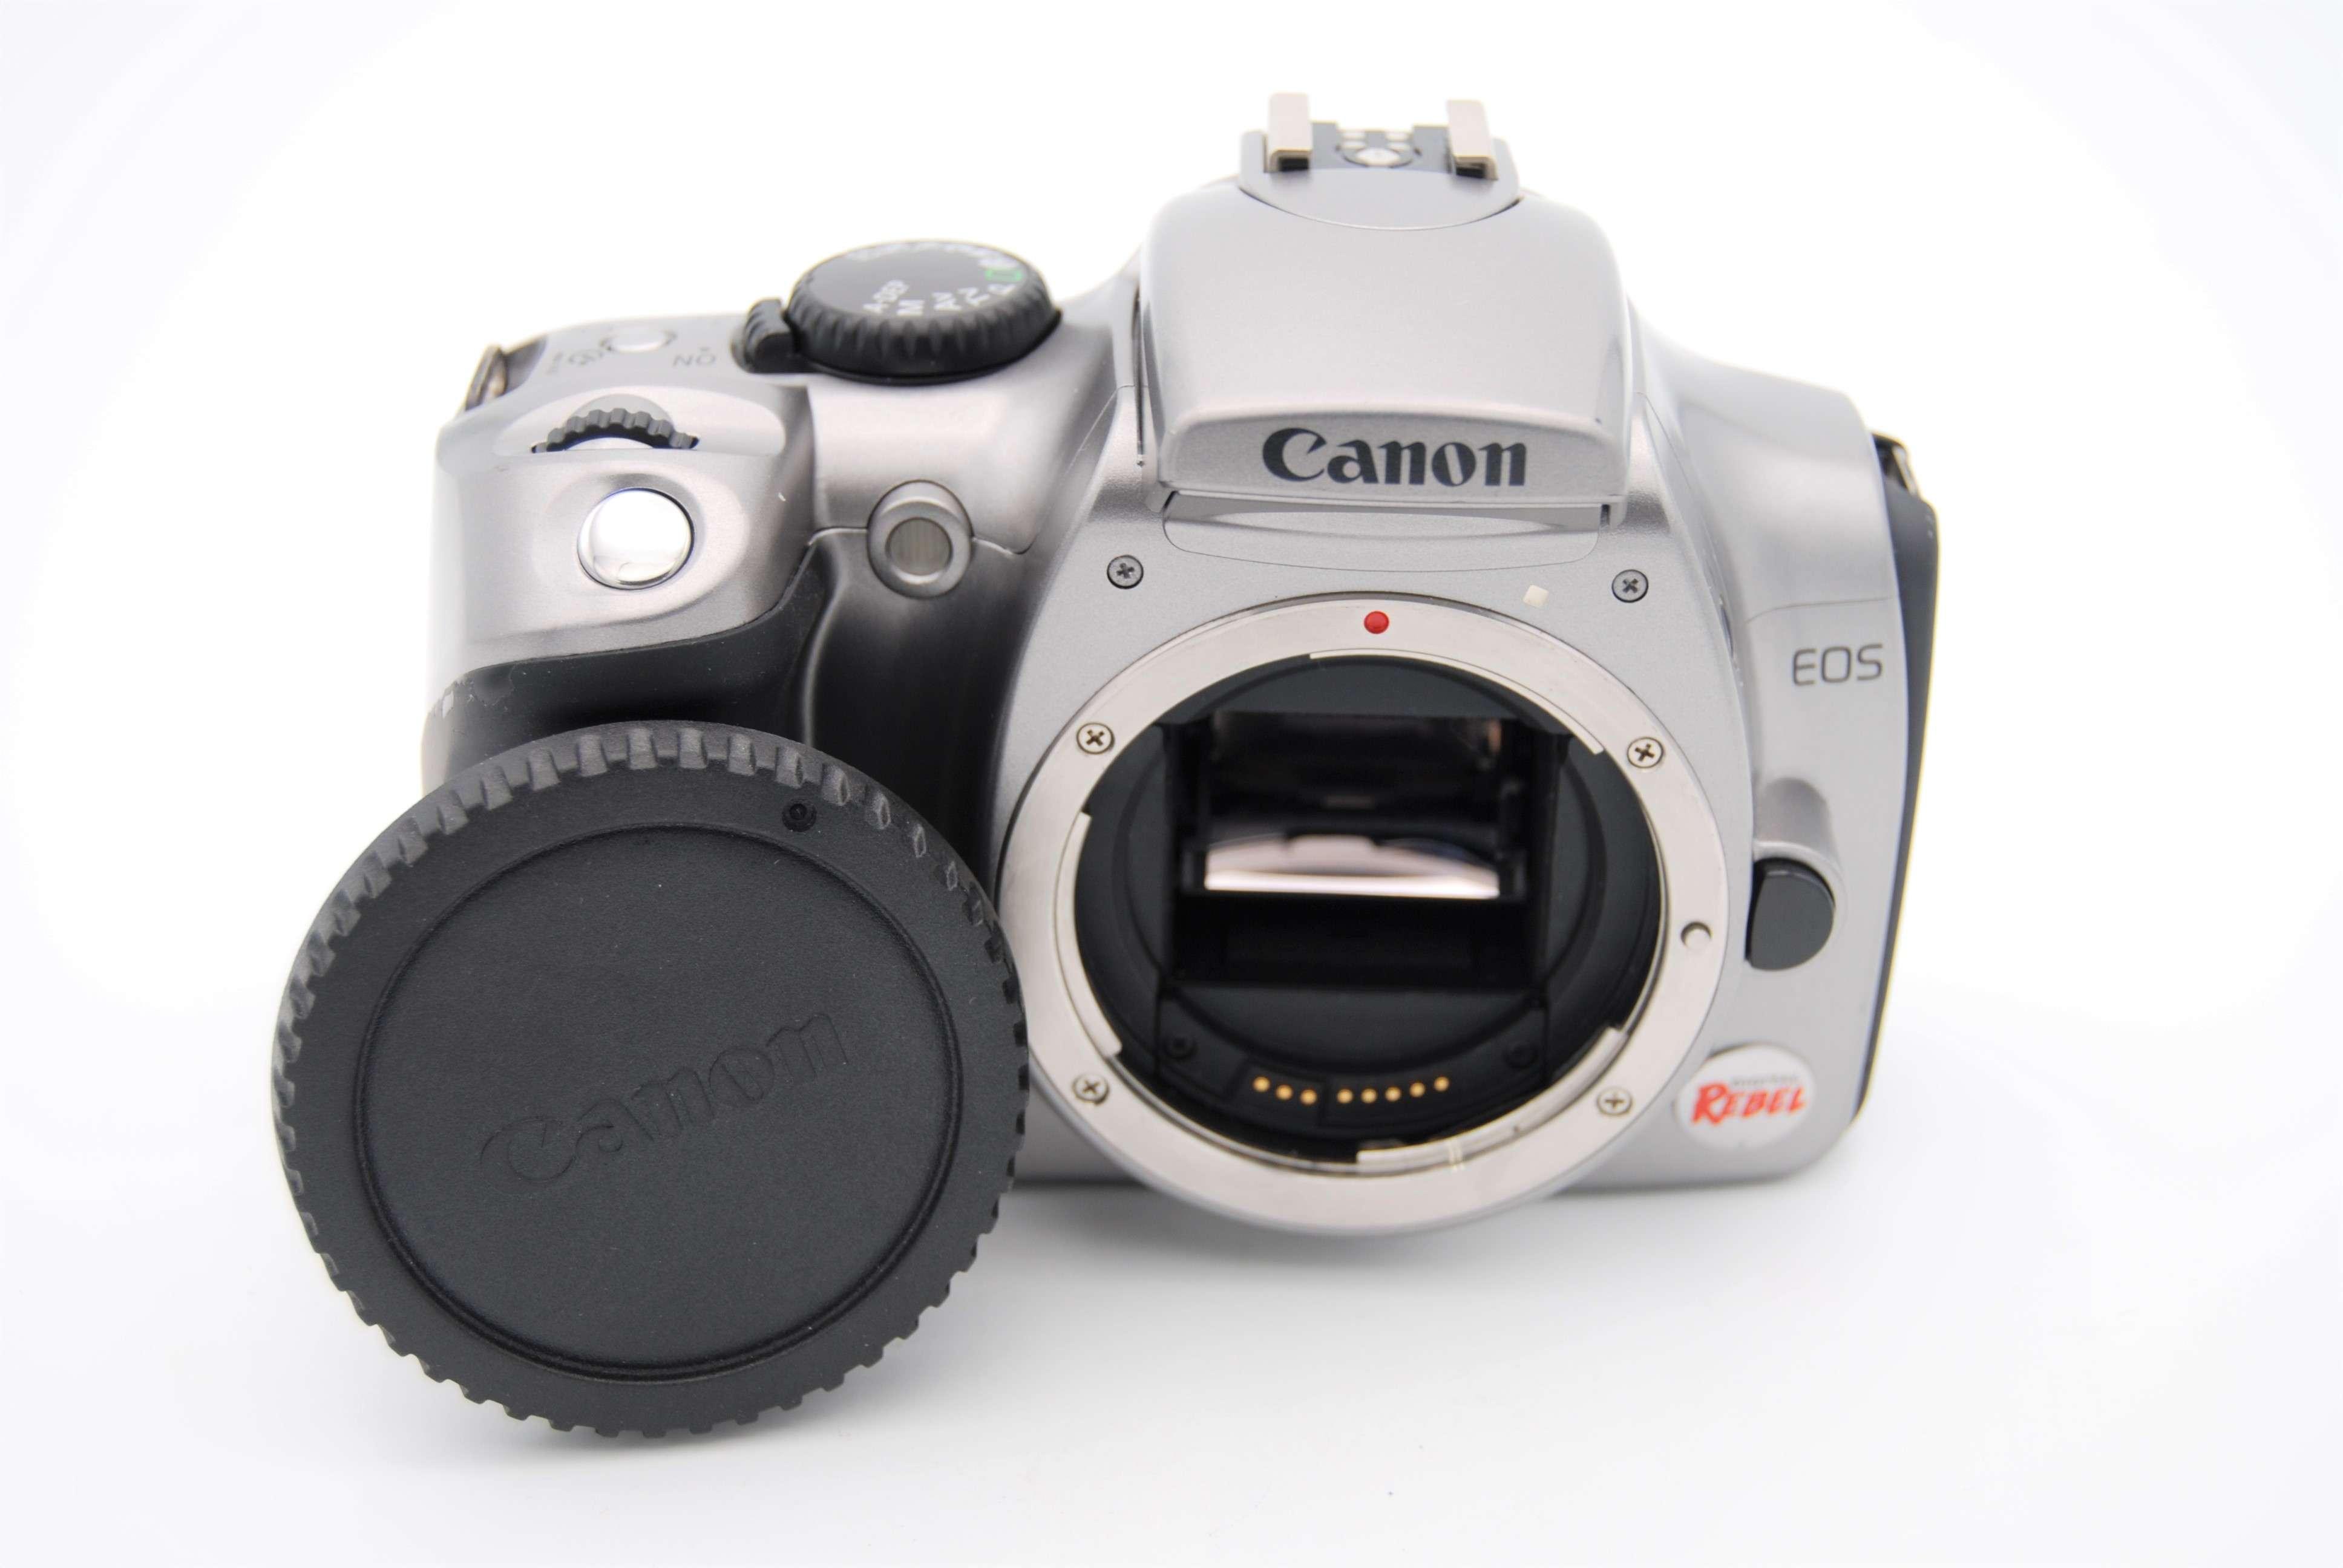 canon eos digital rebel eos 300d 6 3mp digital slr camera silver rh ebay com Canon EOS Rebel Manual PDF Canon EOS Rebel T3 Manual